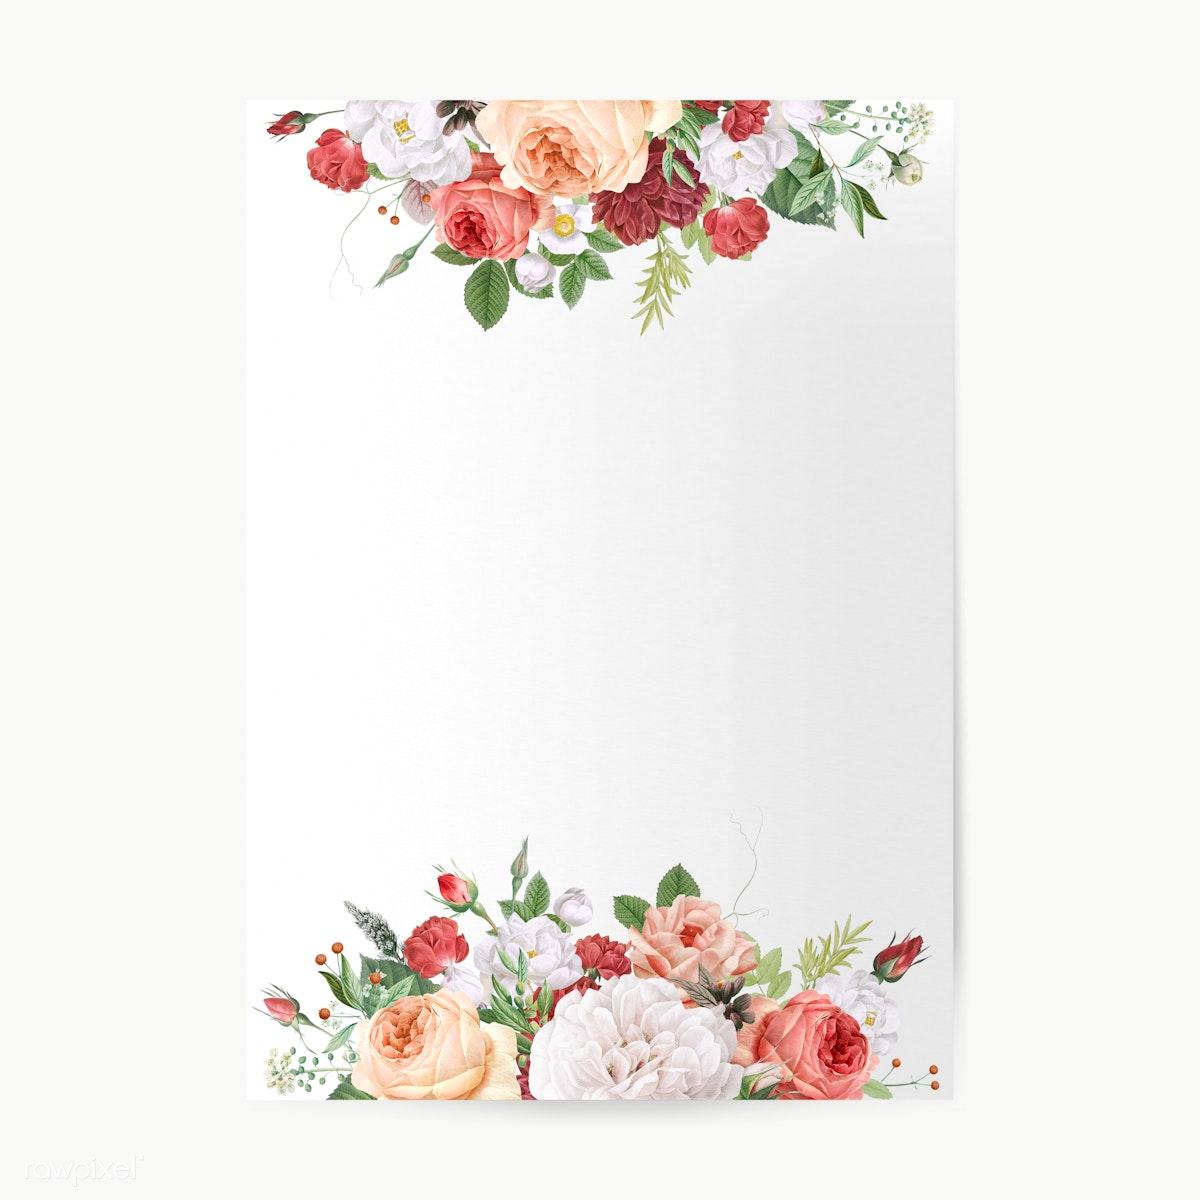 Floral Wedding Invitations.Floral Design Wedding Invitation Mockup Royalty Free Stock